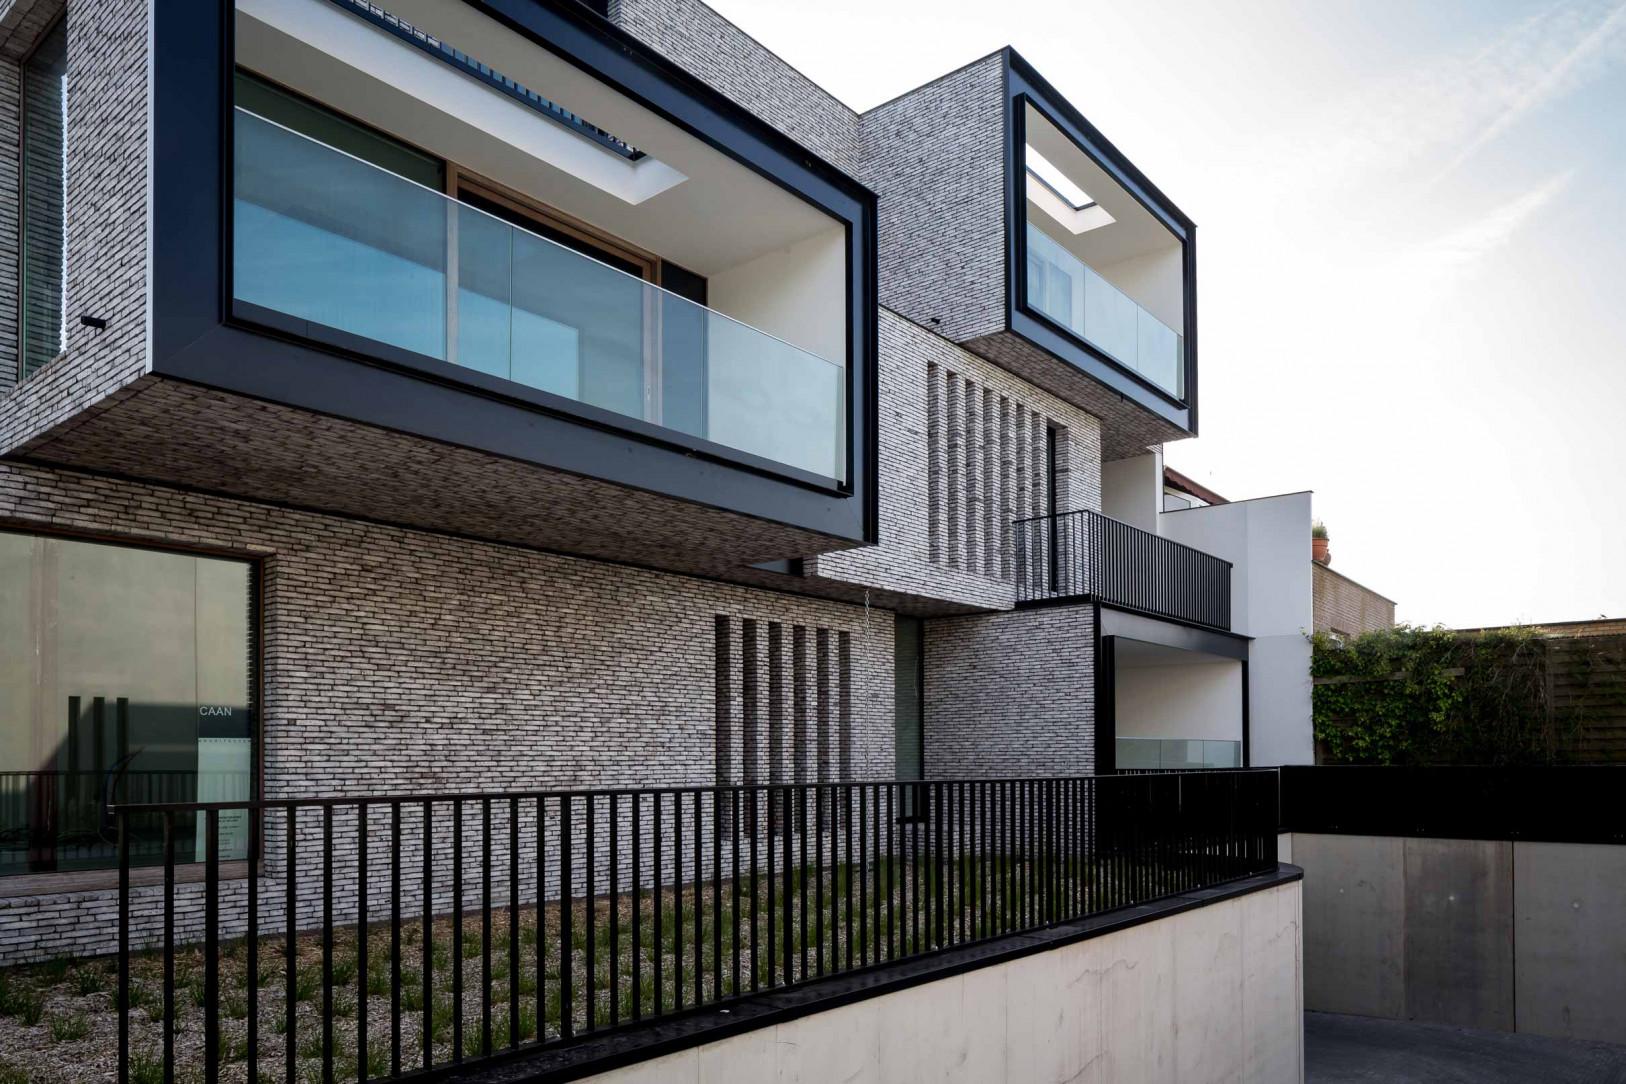 Rietveldprojects.be-Bauhaus-appartement-design-architectuur-kust17.jpg